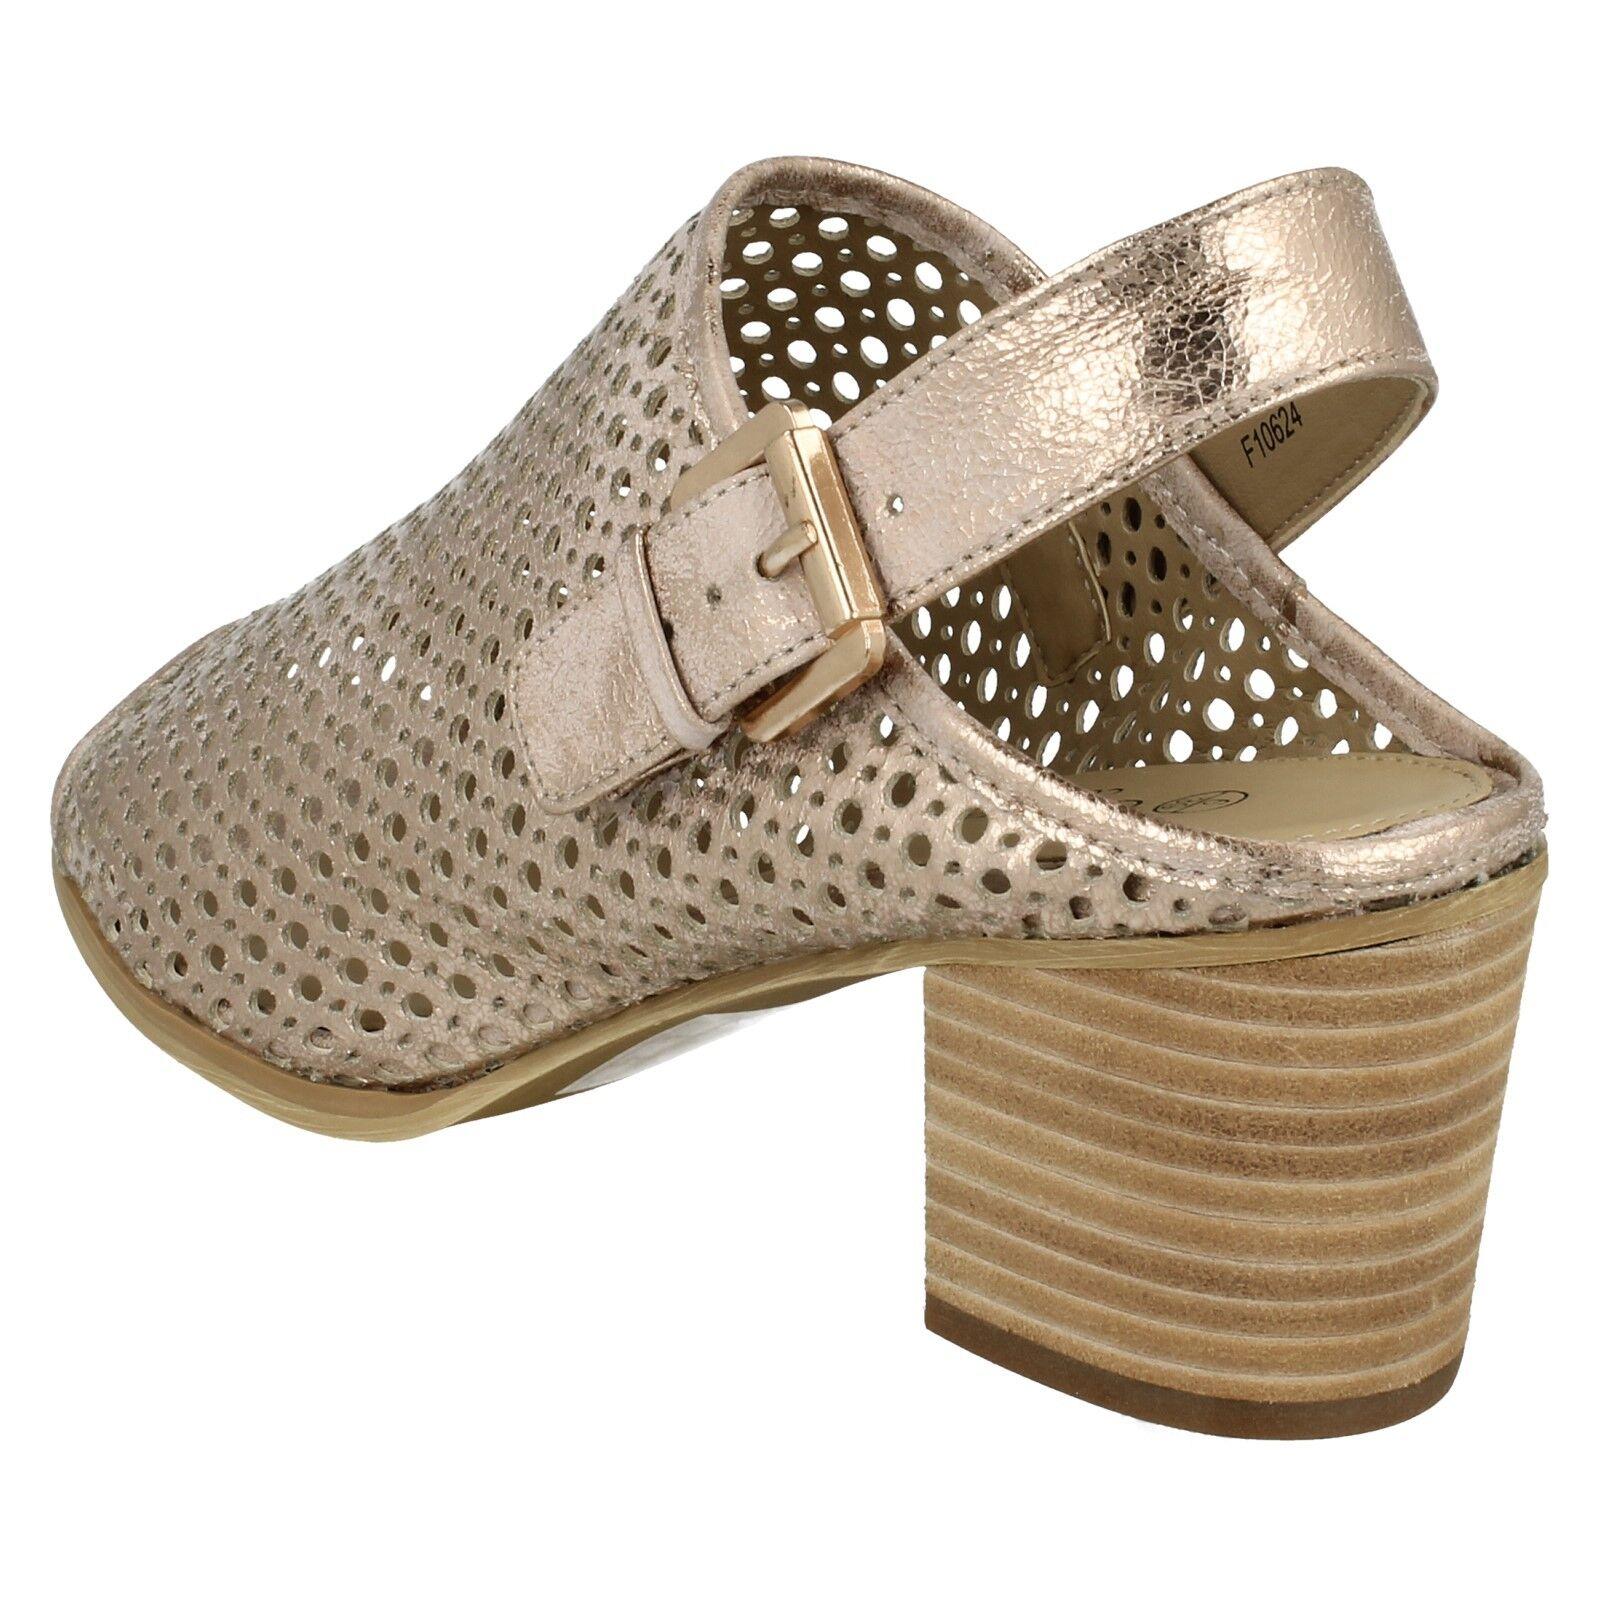 Damen Savannah Sandalen peeptoe blockabsatz Riemen Sommer Sandalen Savannah f10624 0a33c1